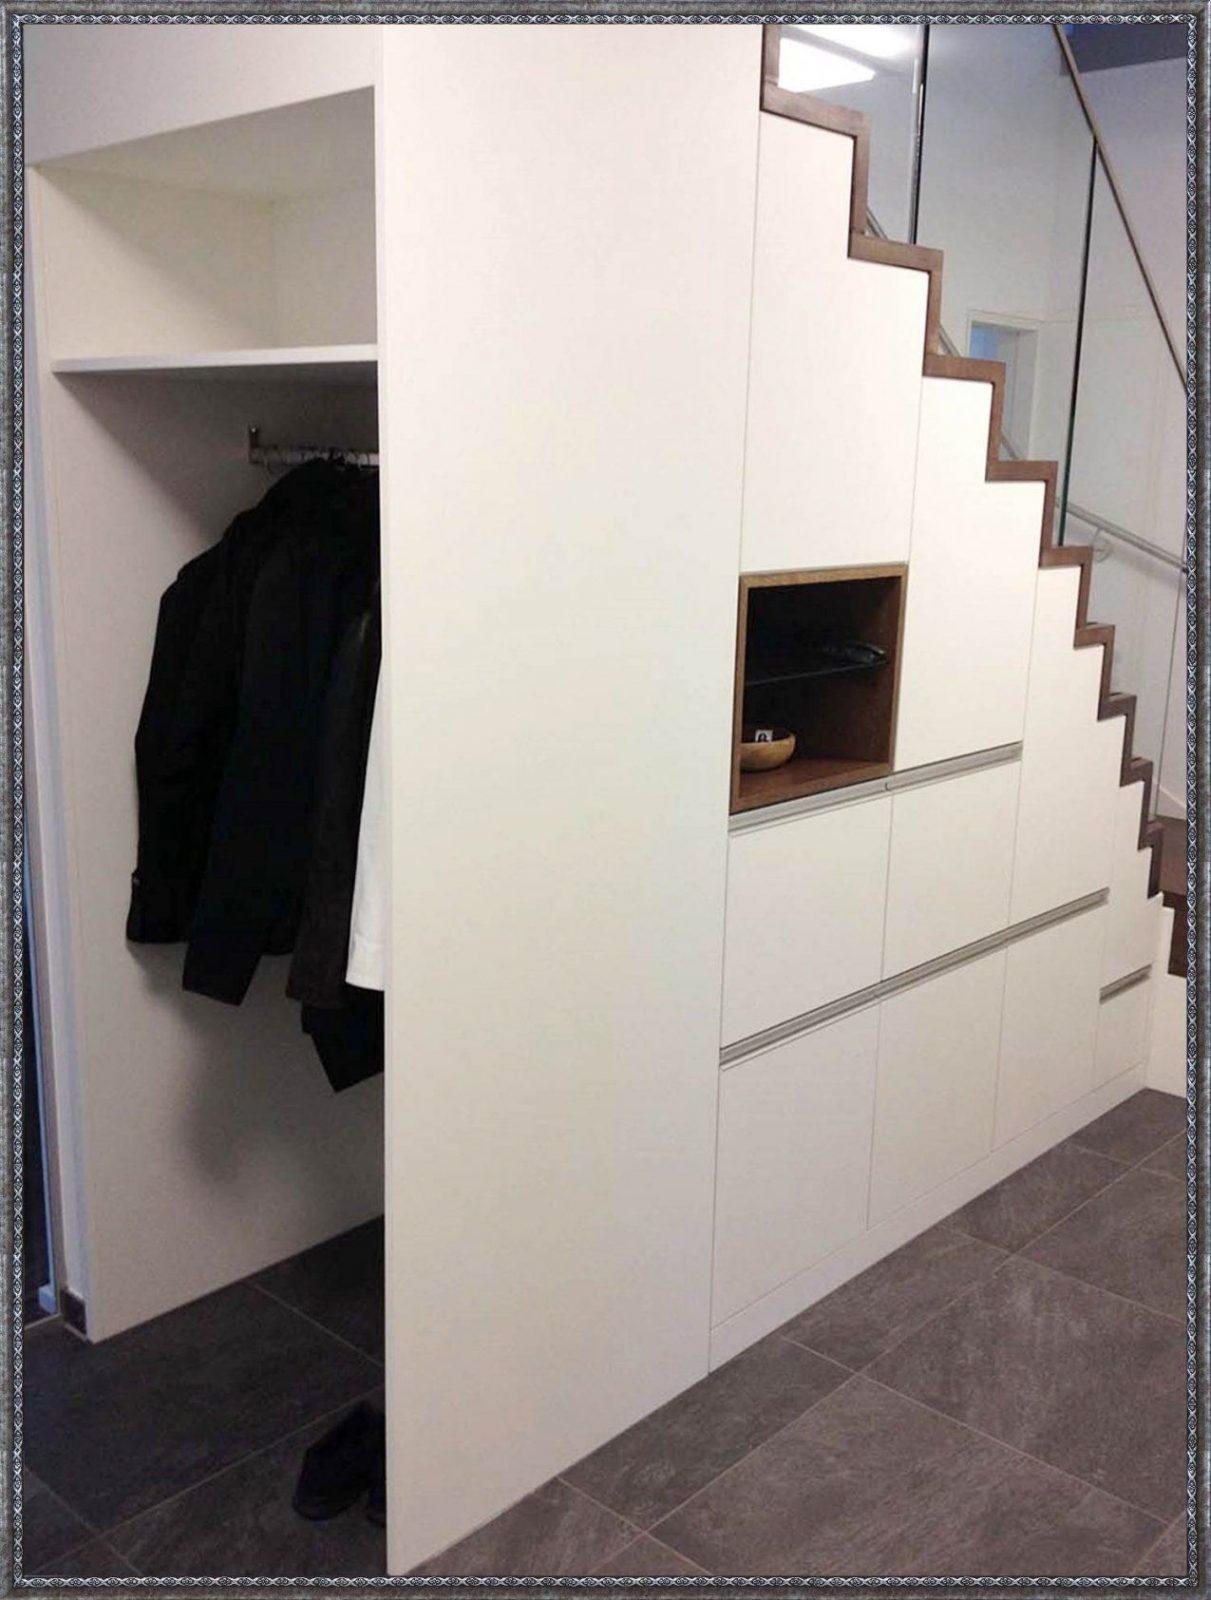 Schrank Unter Treppe Ikea Inspirierend Wand Betreffend Schrank Unter von Stauraum Unter Treppe Ikea Photo